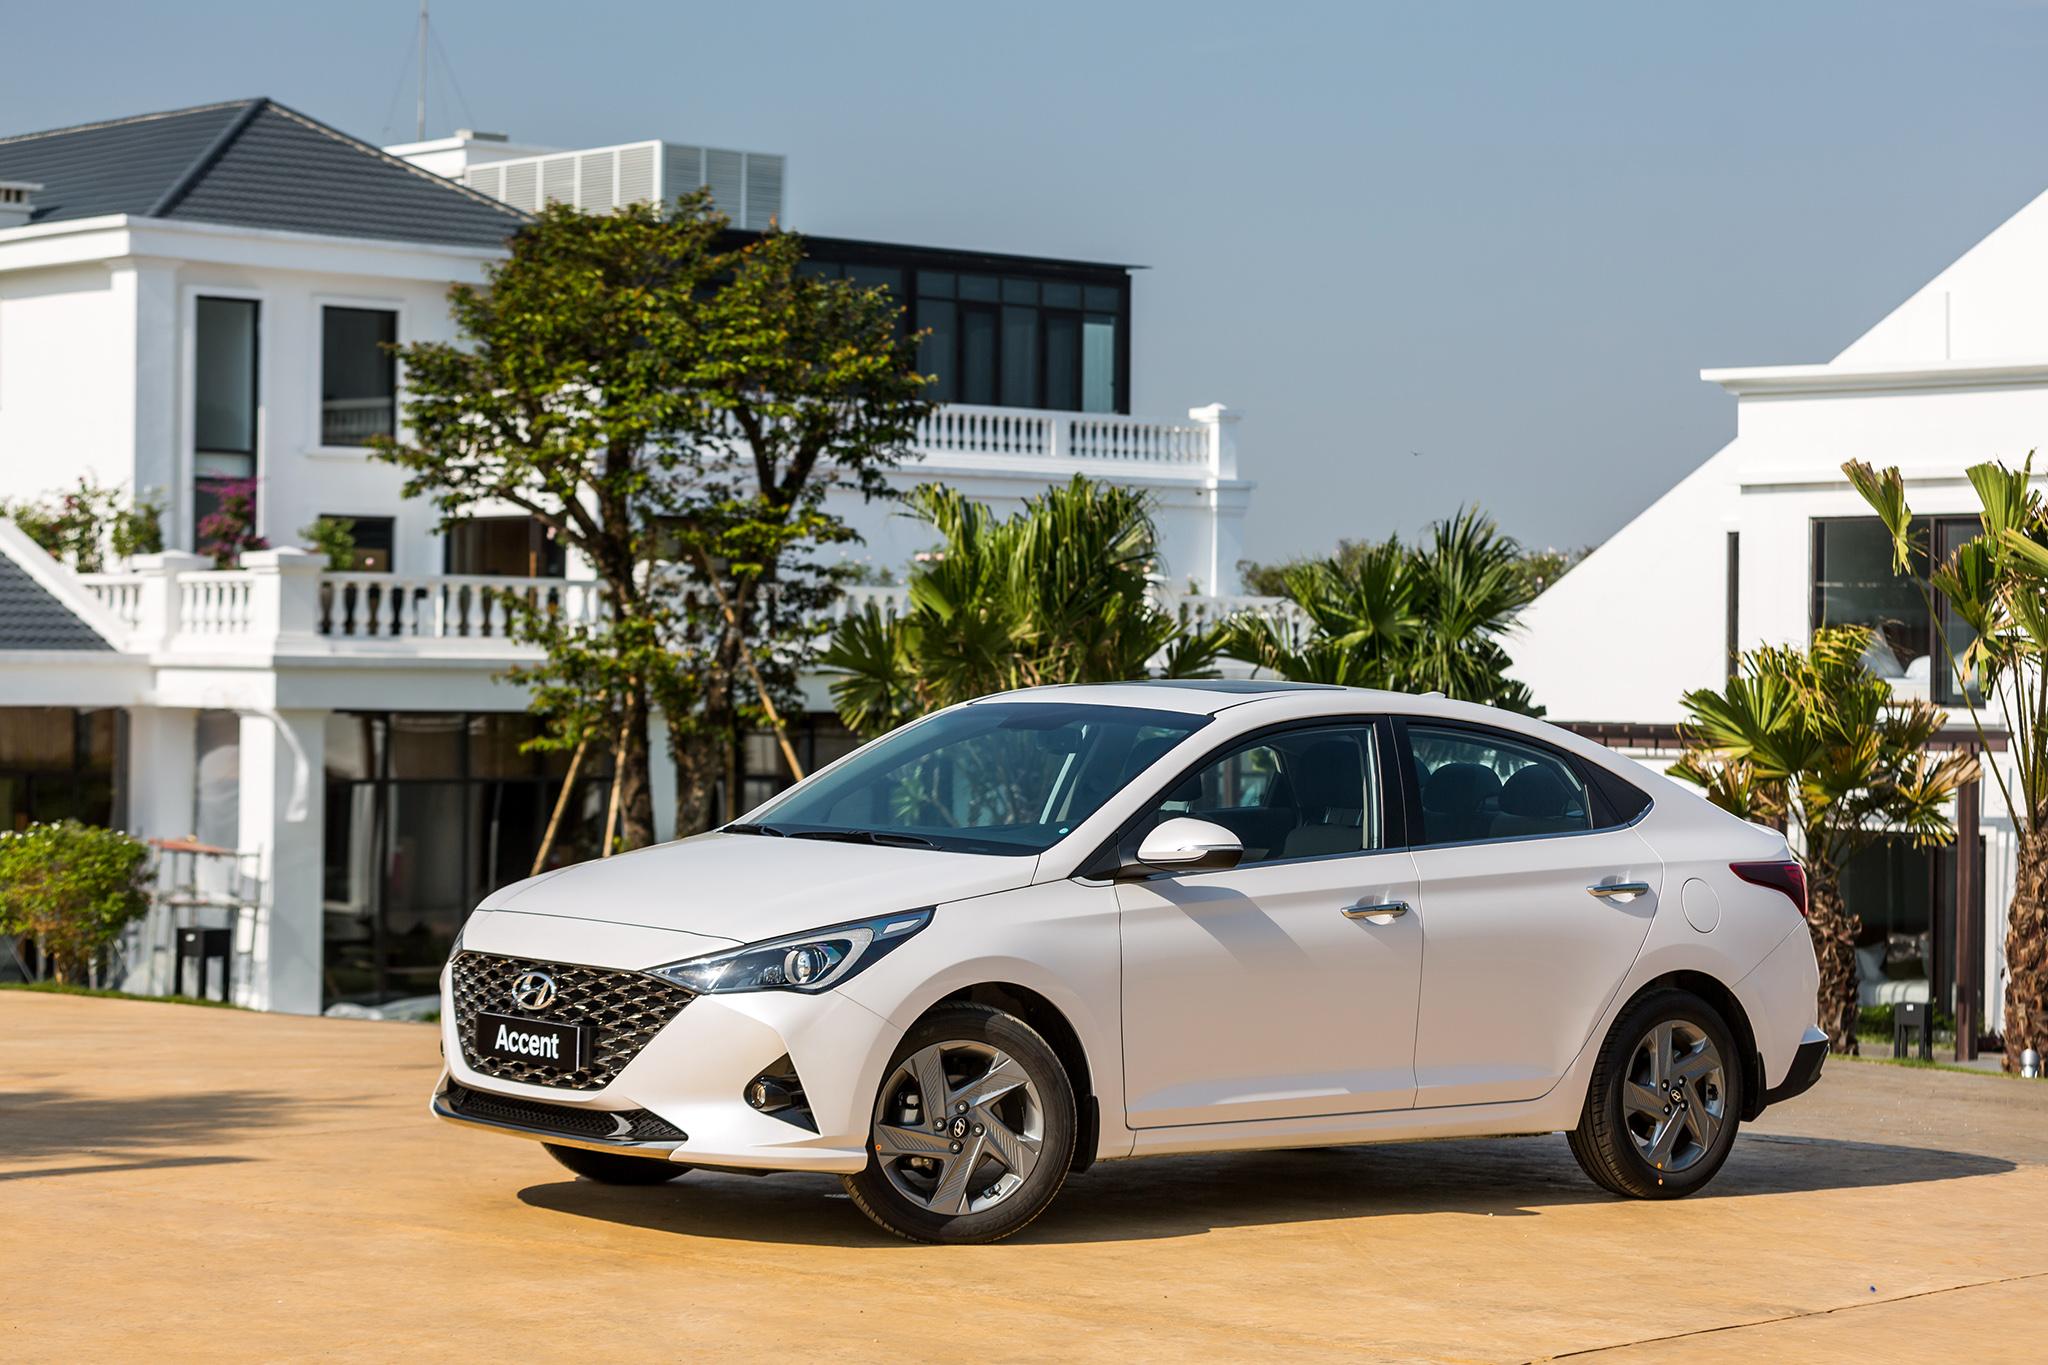 Hyundai Accent upgraded version 2021. Photo: TC Motor